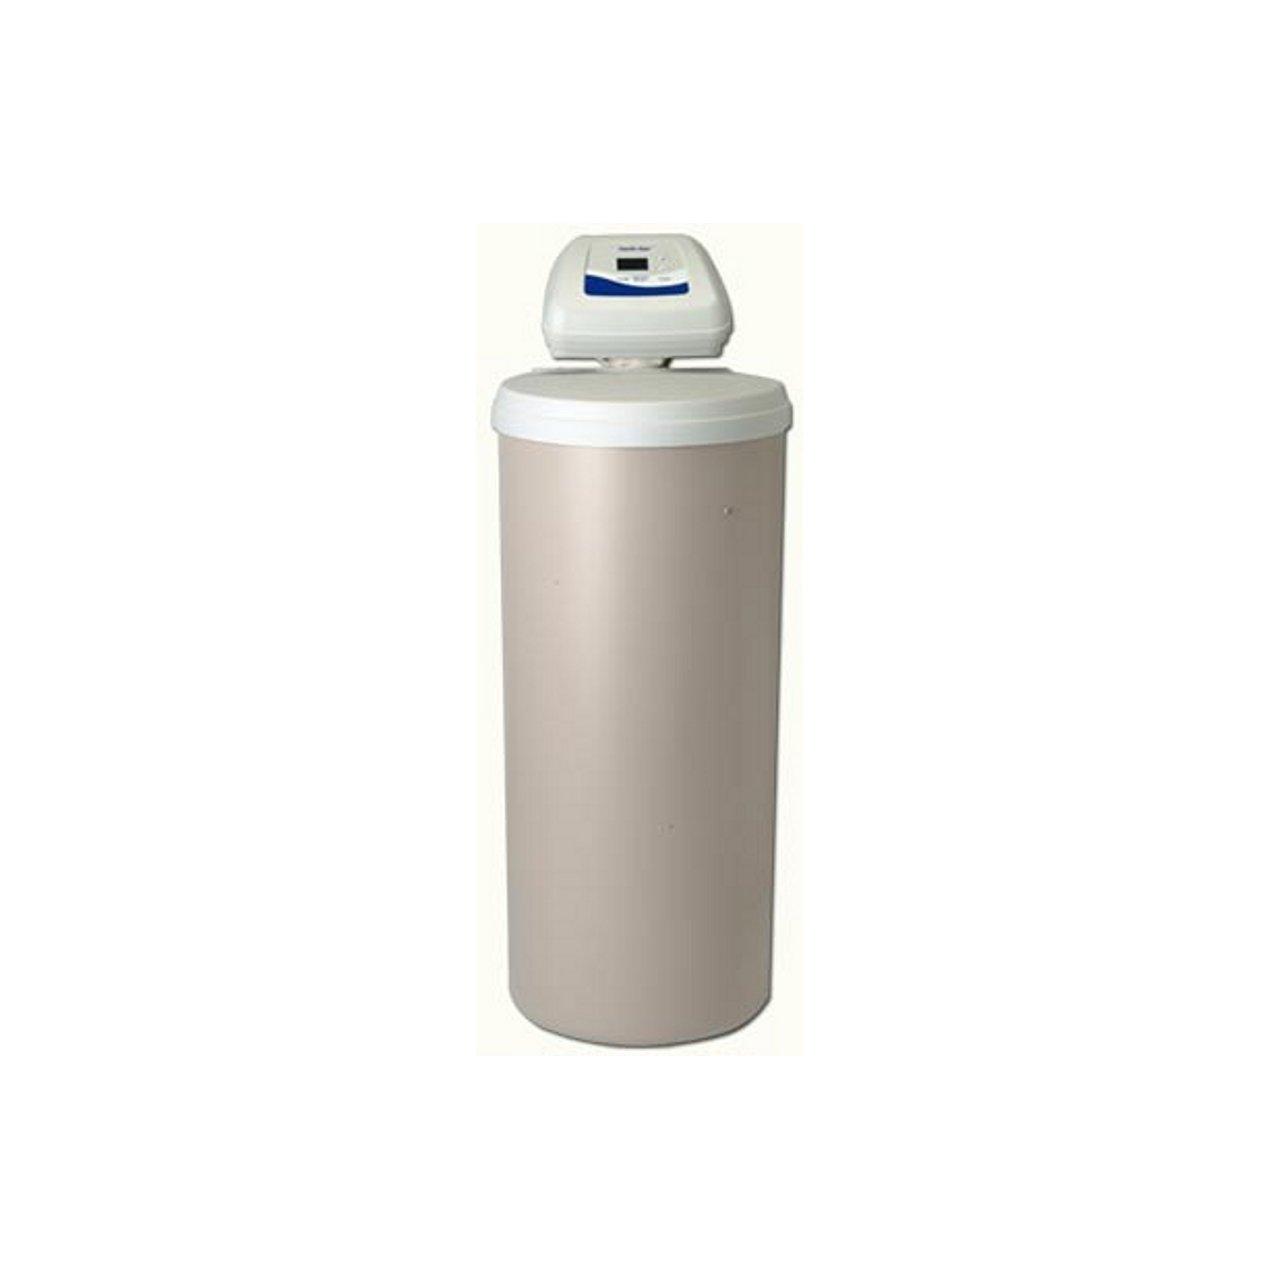 Water Pro Water Softener Best Water Softener - Bing images